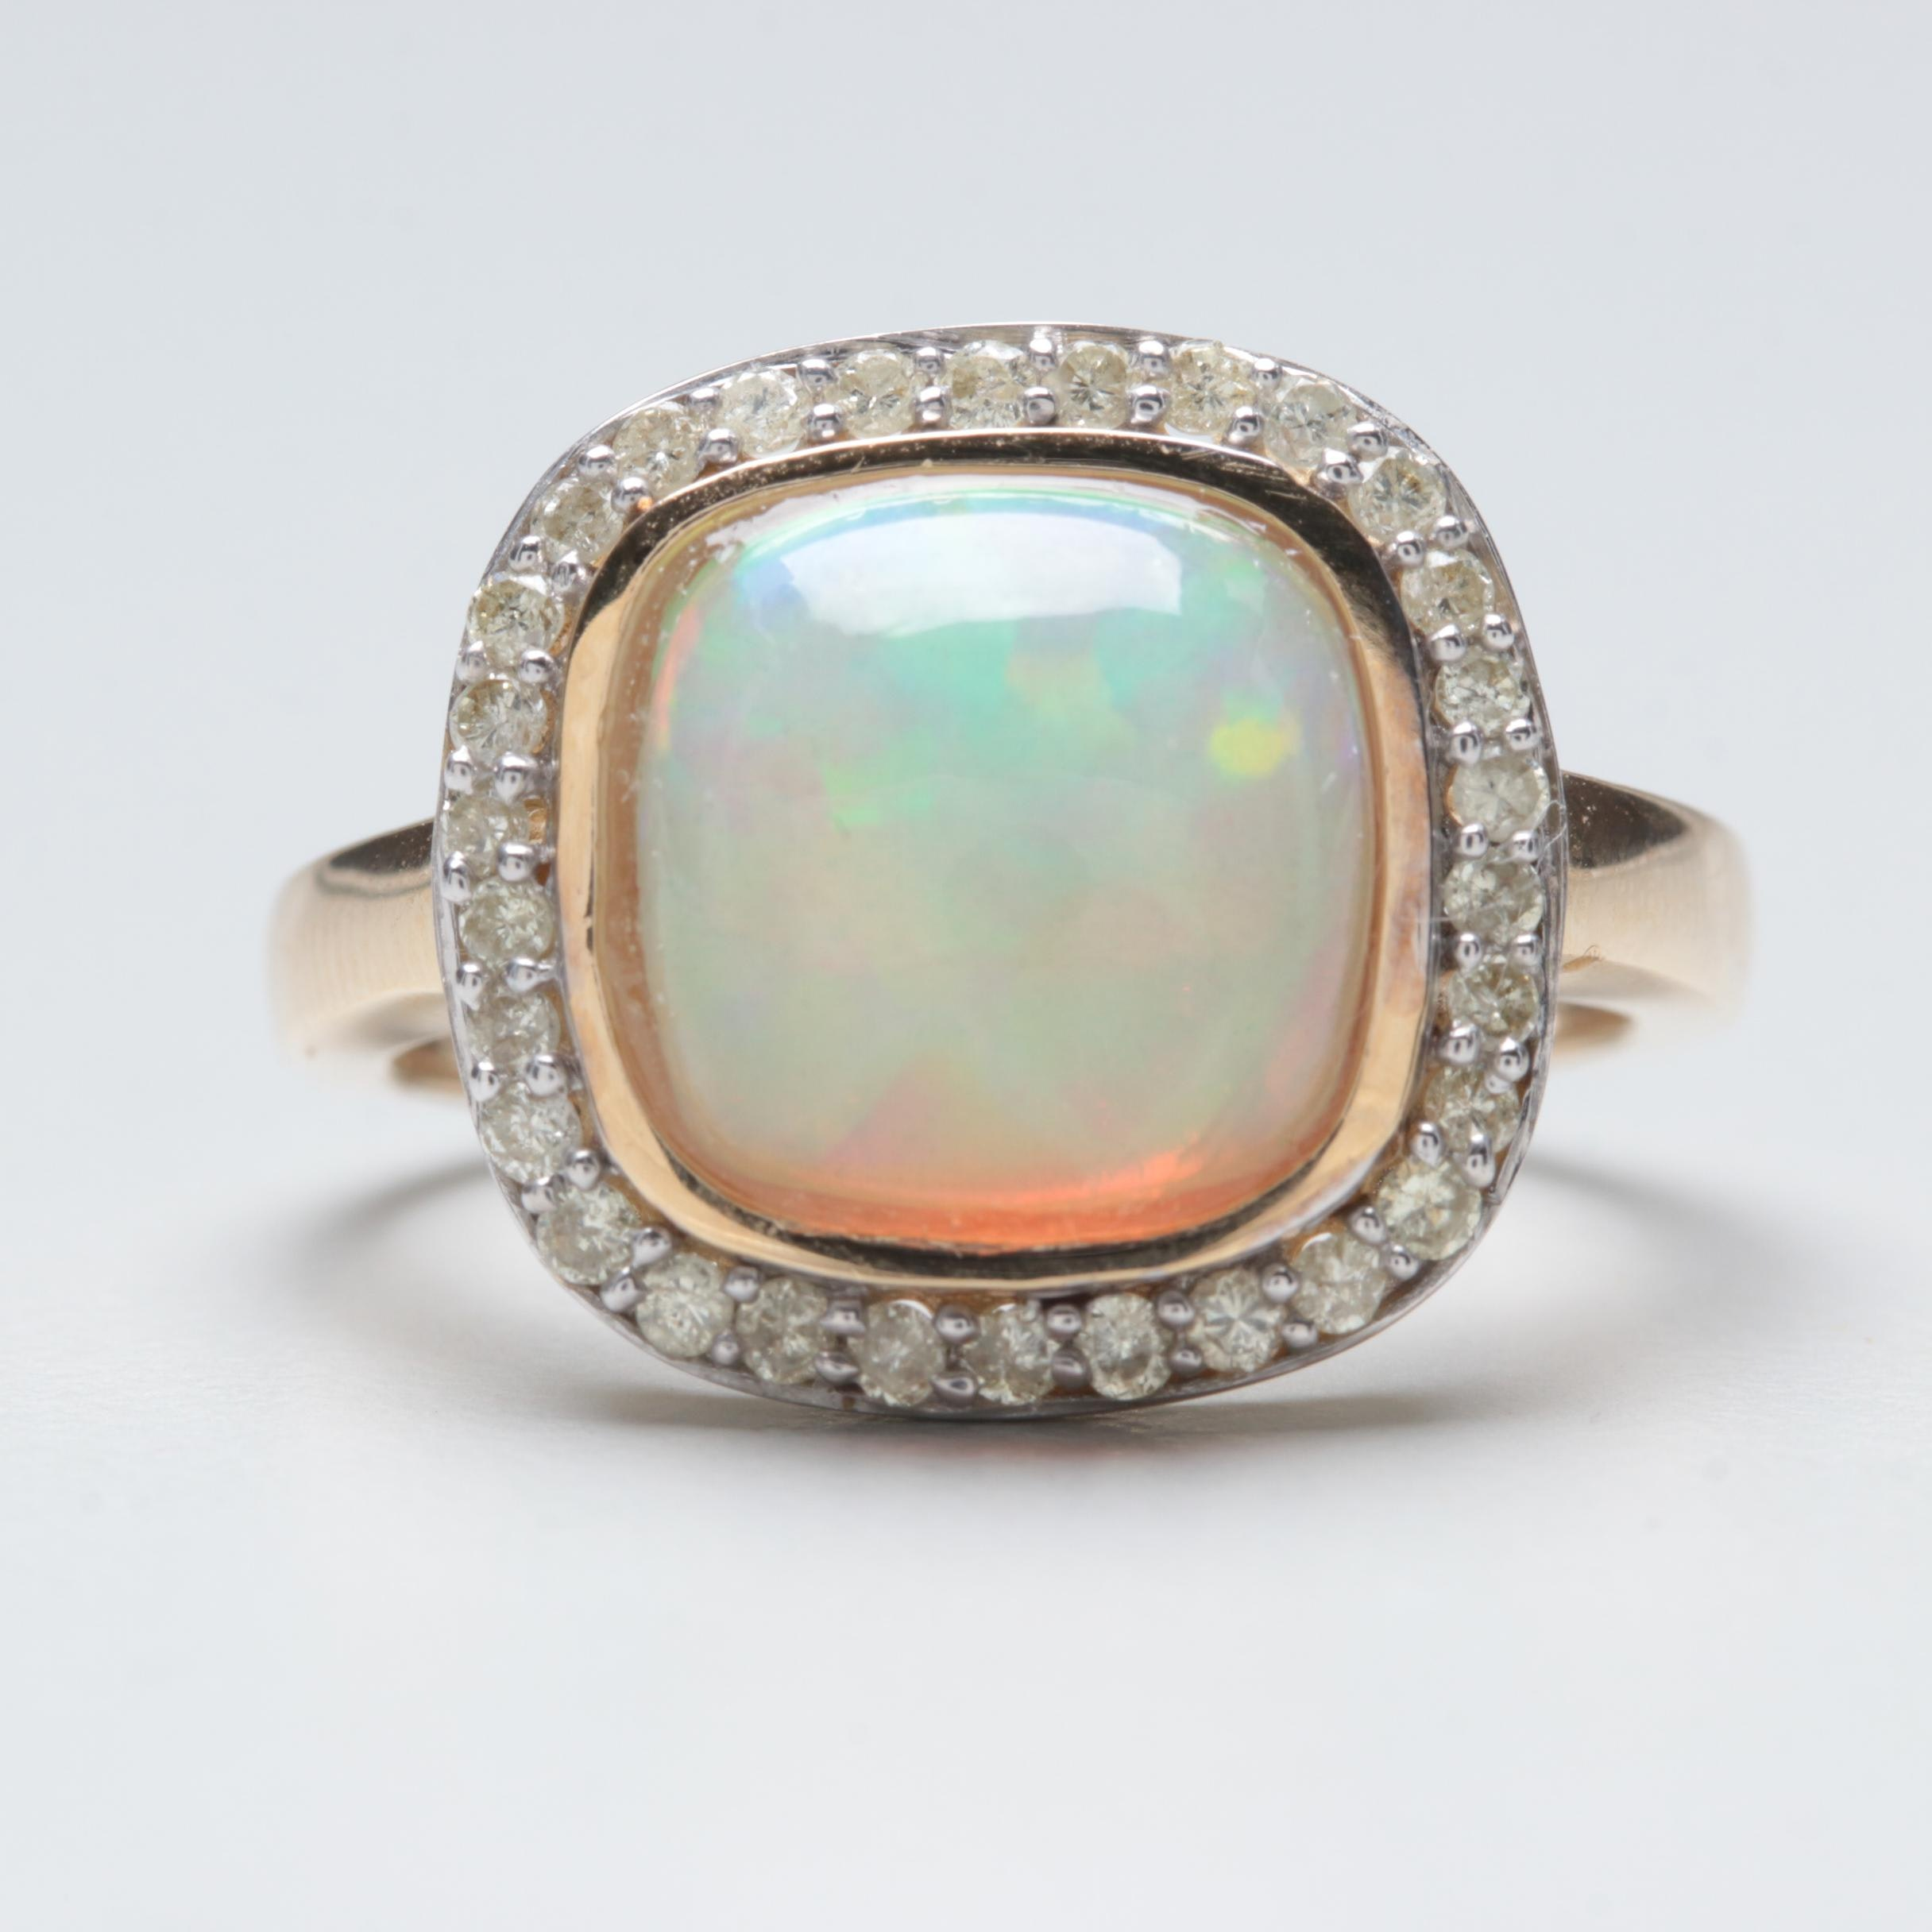 14K Yellow Gold Opal Cabochon and Diamond Ring